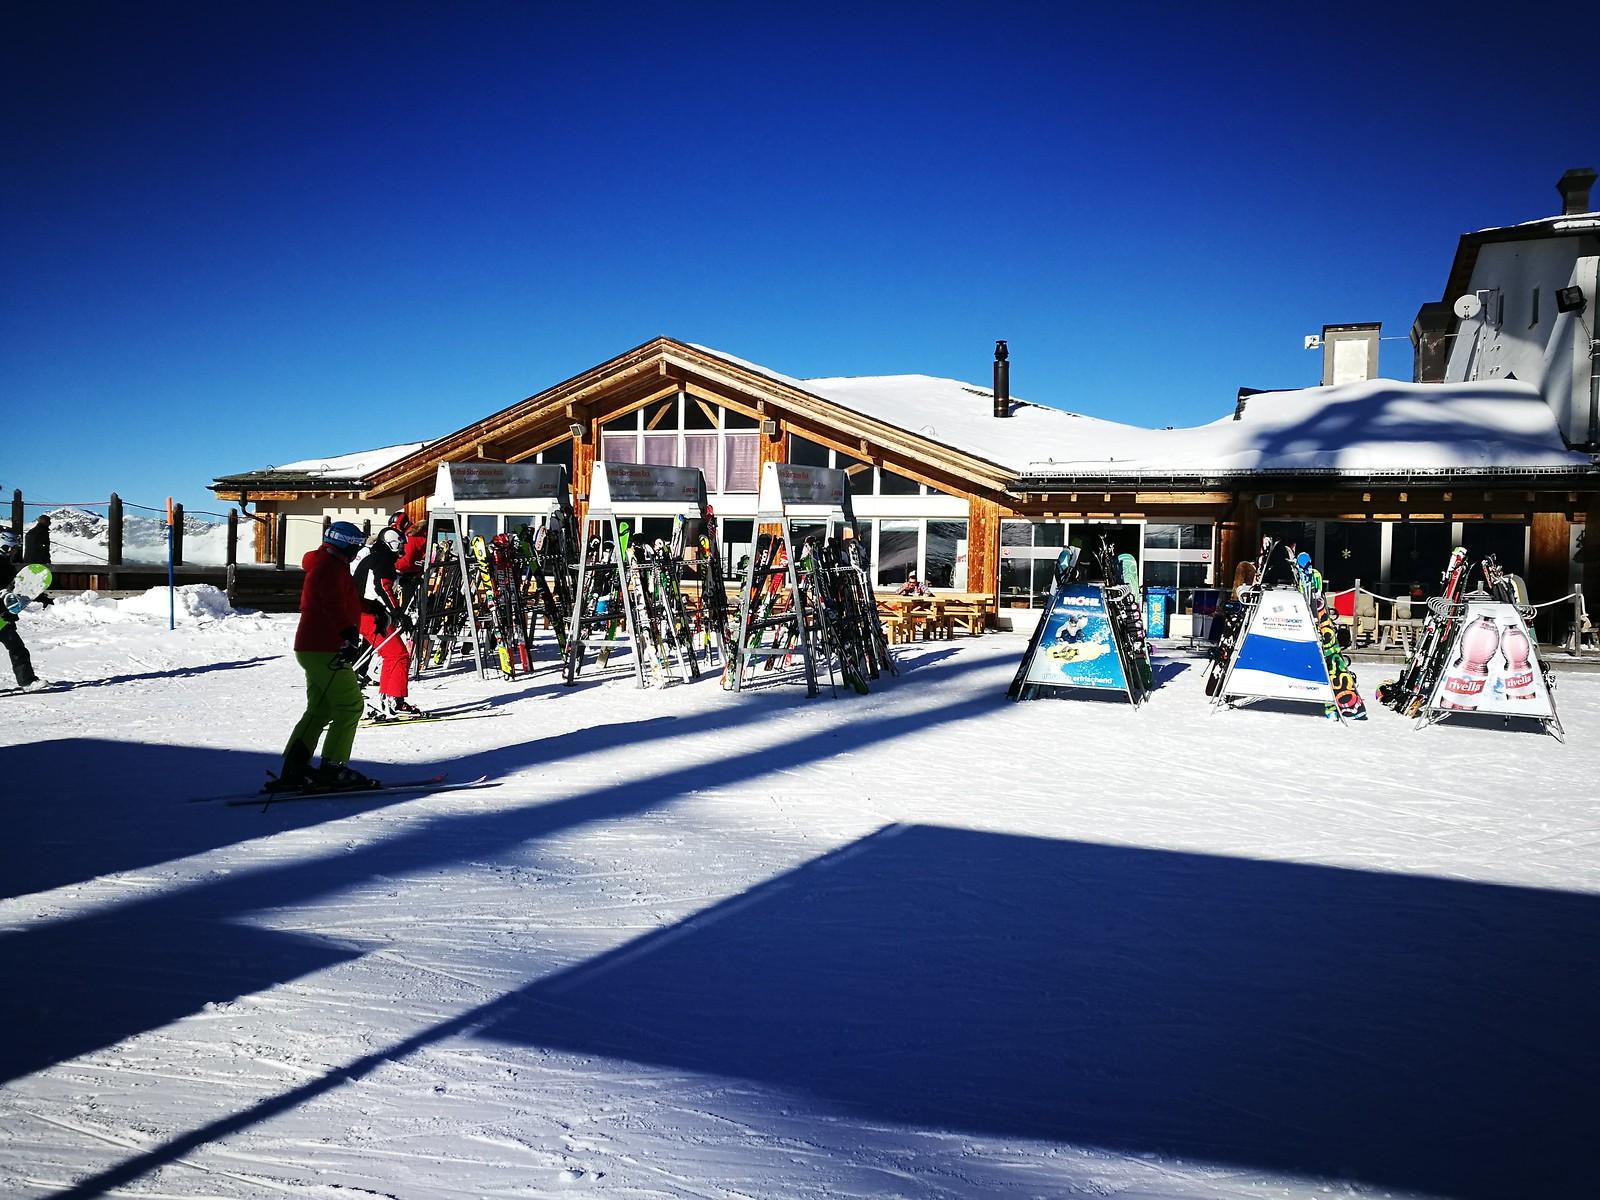 Ski lodge in the mid mountain